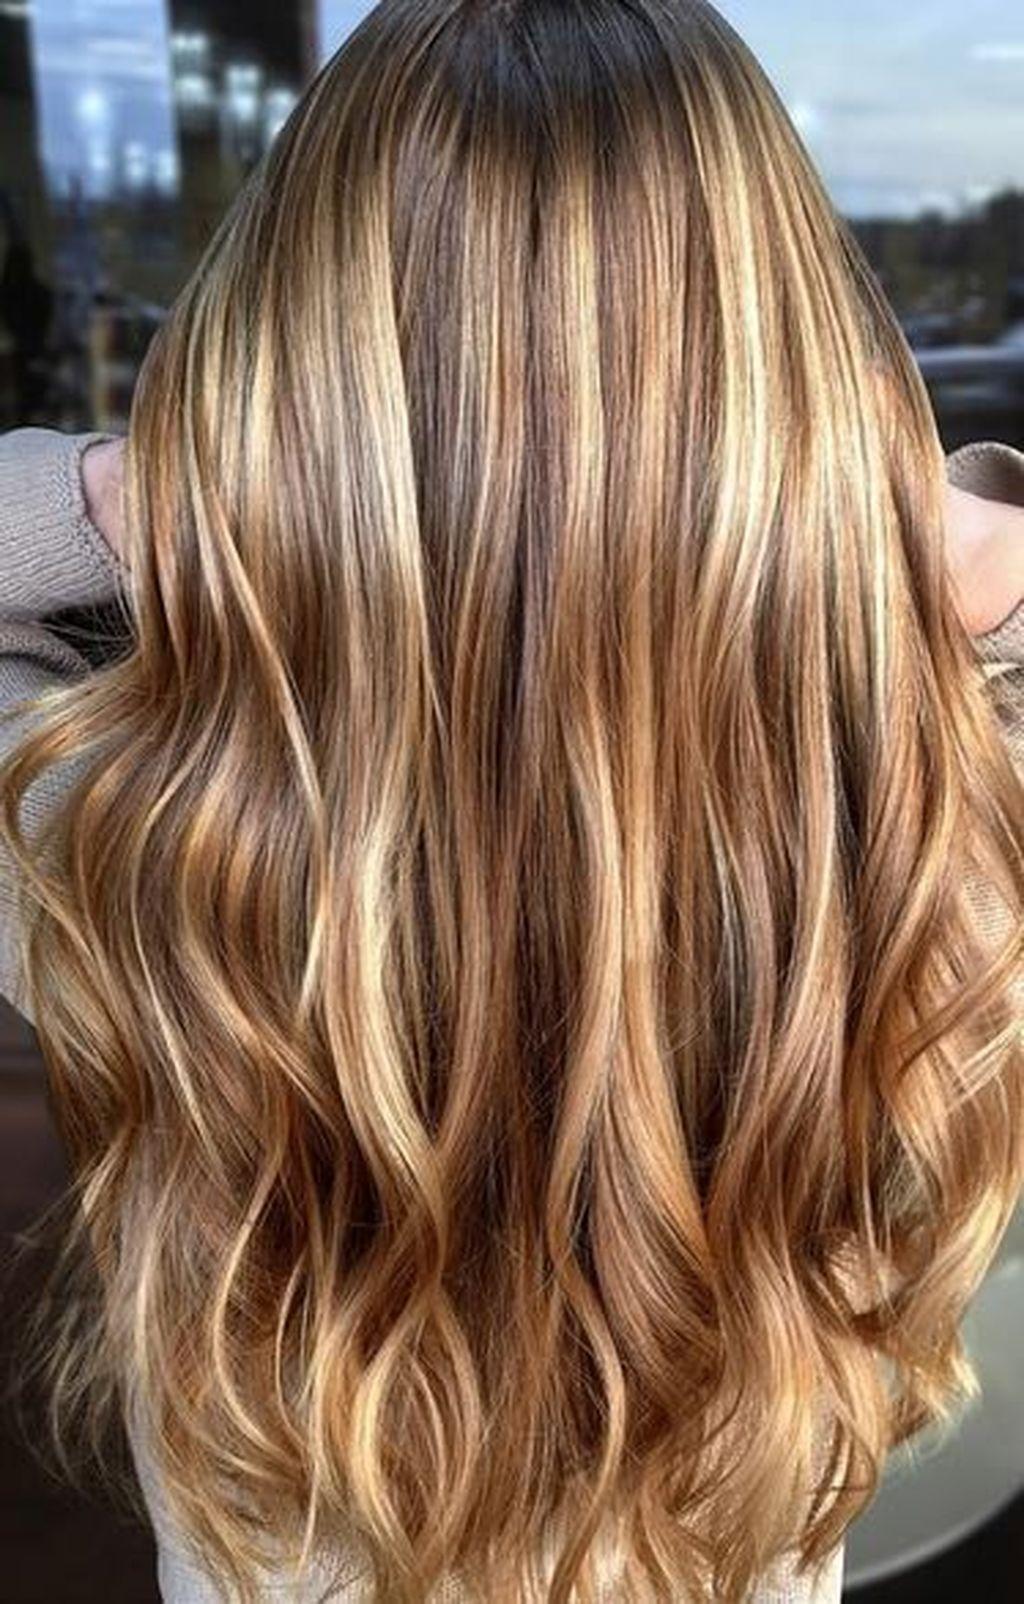 50 Elegant Spring Hair Color Ideas For 2019 Caramel Hair Hair